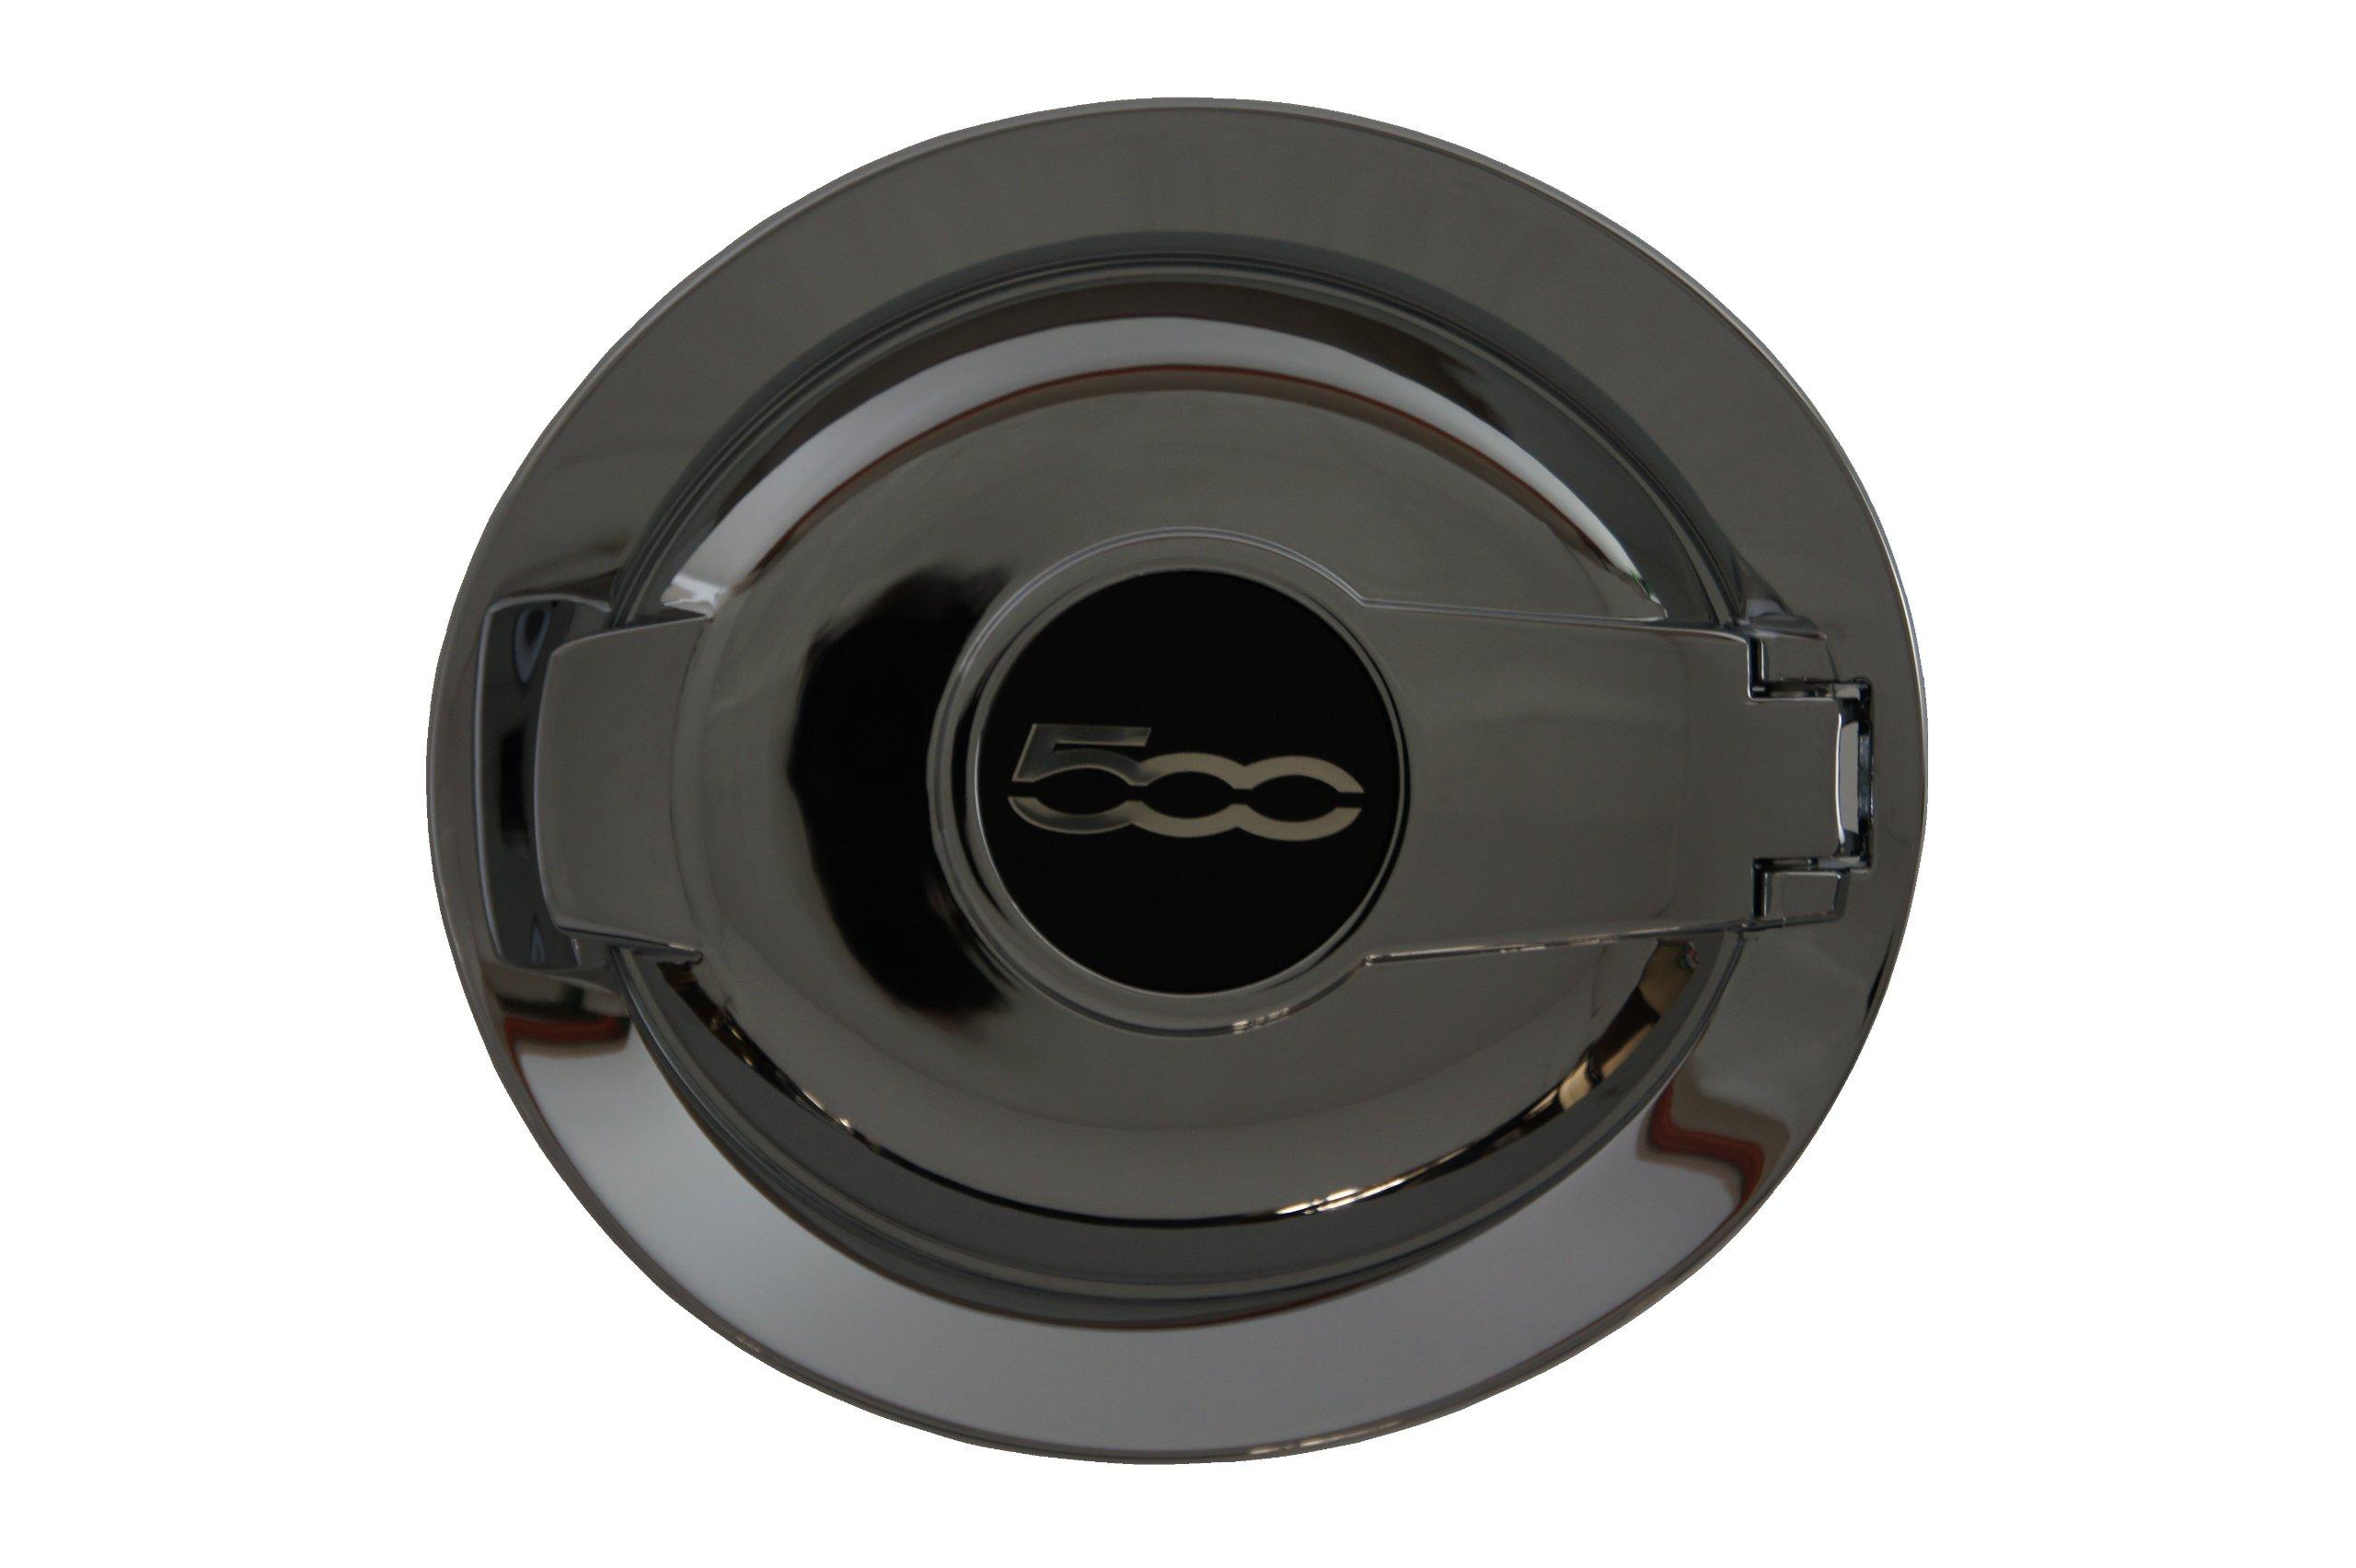 Genuine Fiat Accessories 82212507 Fuel Door for Fiat 500/500C